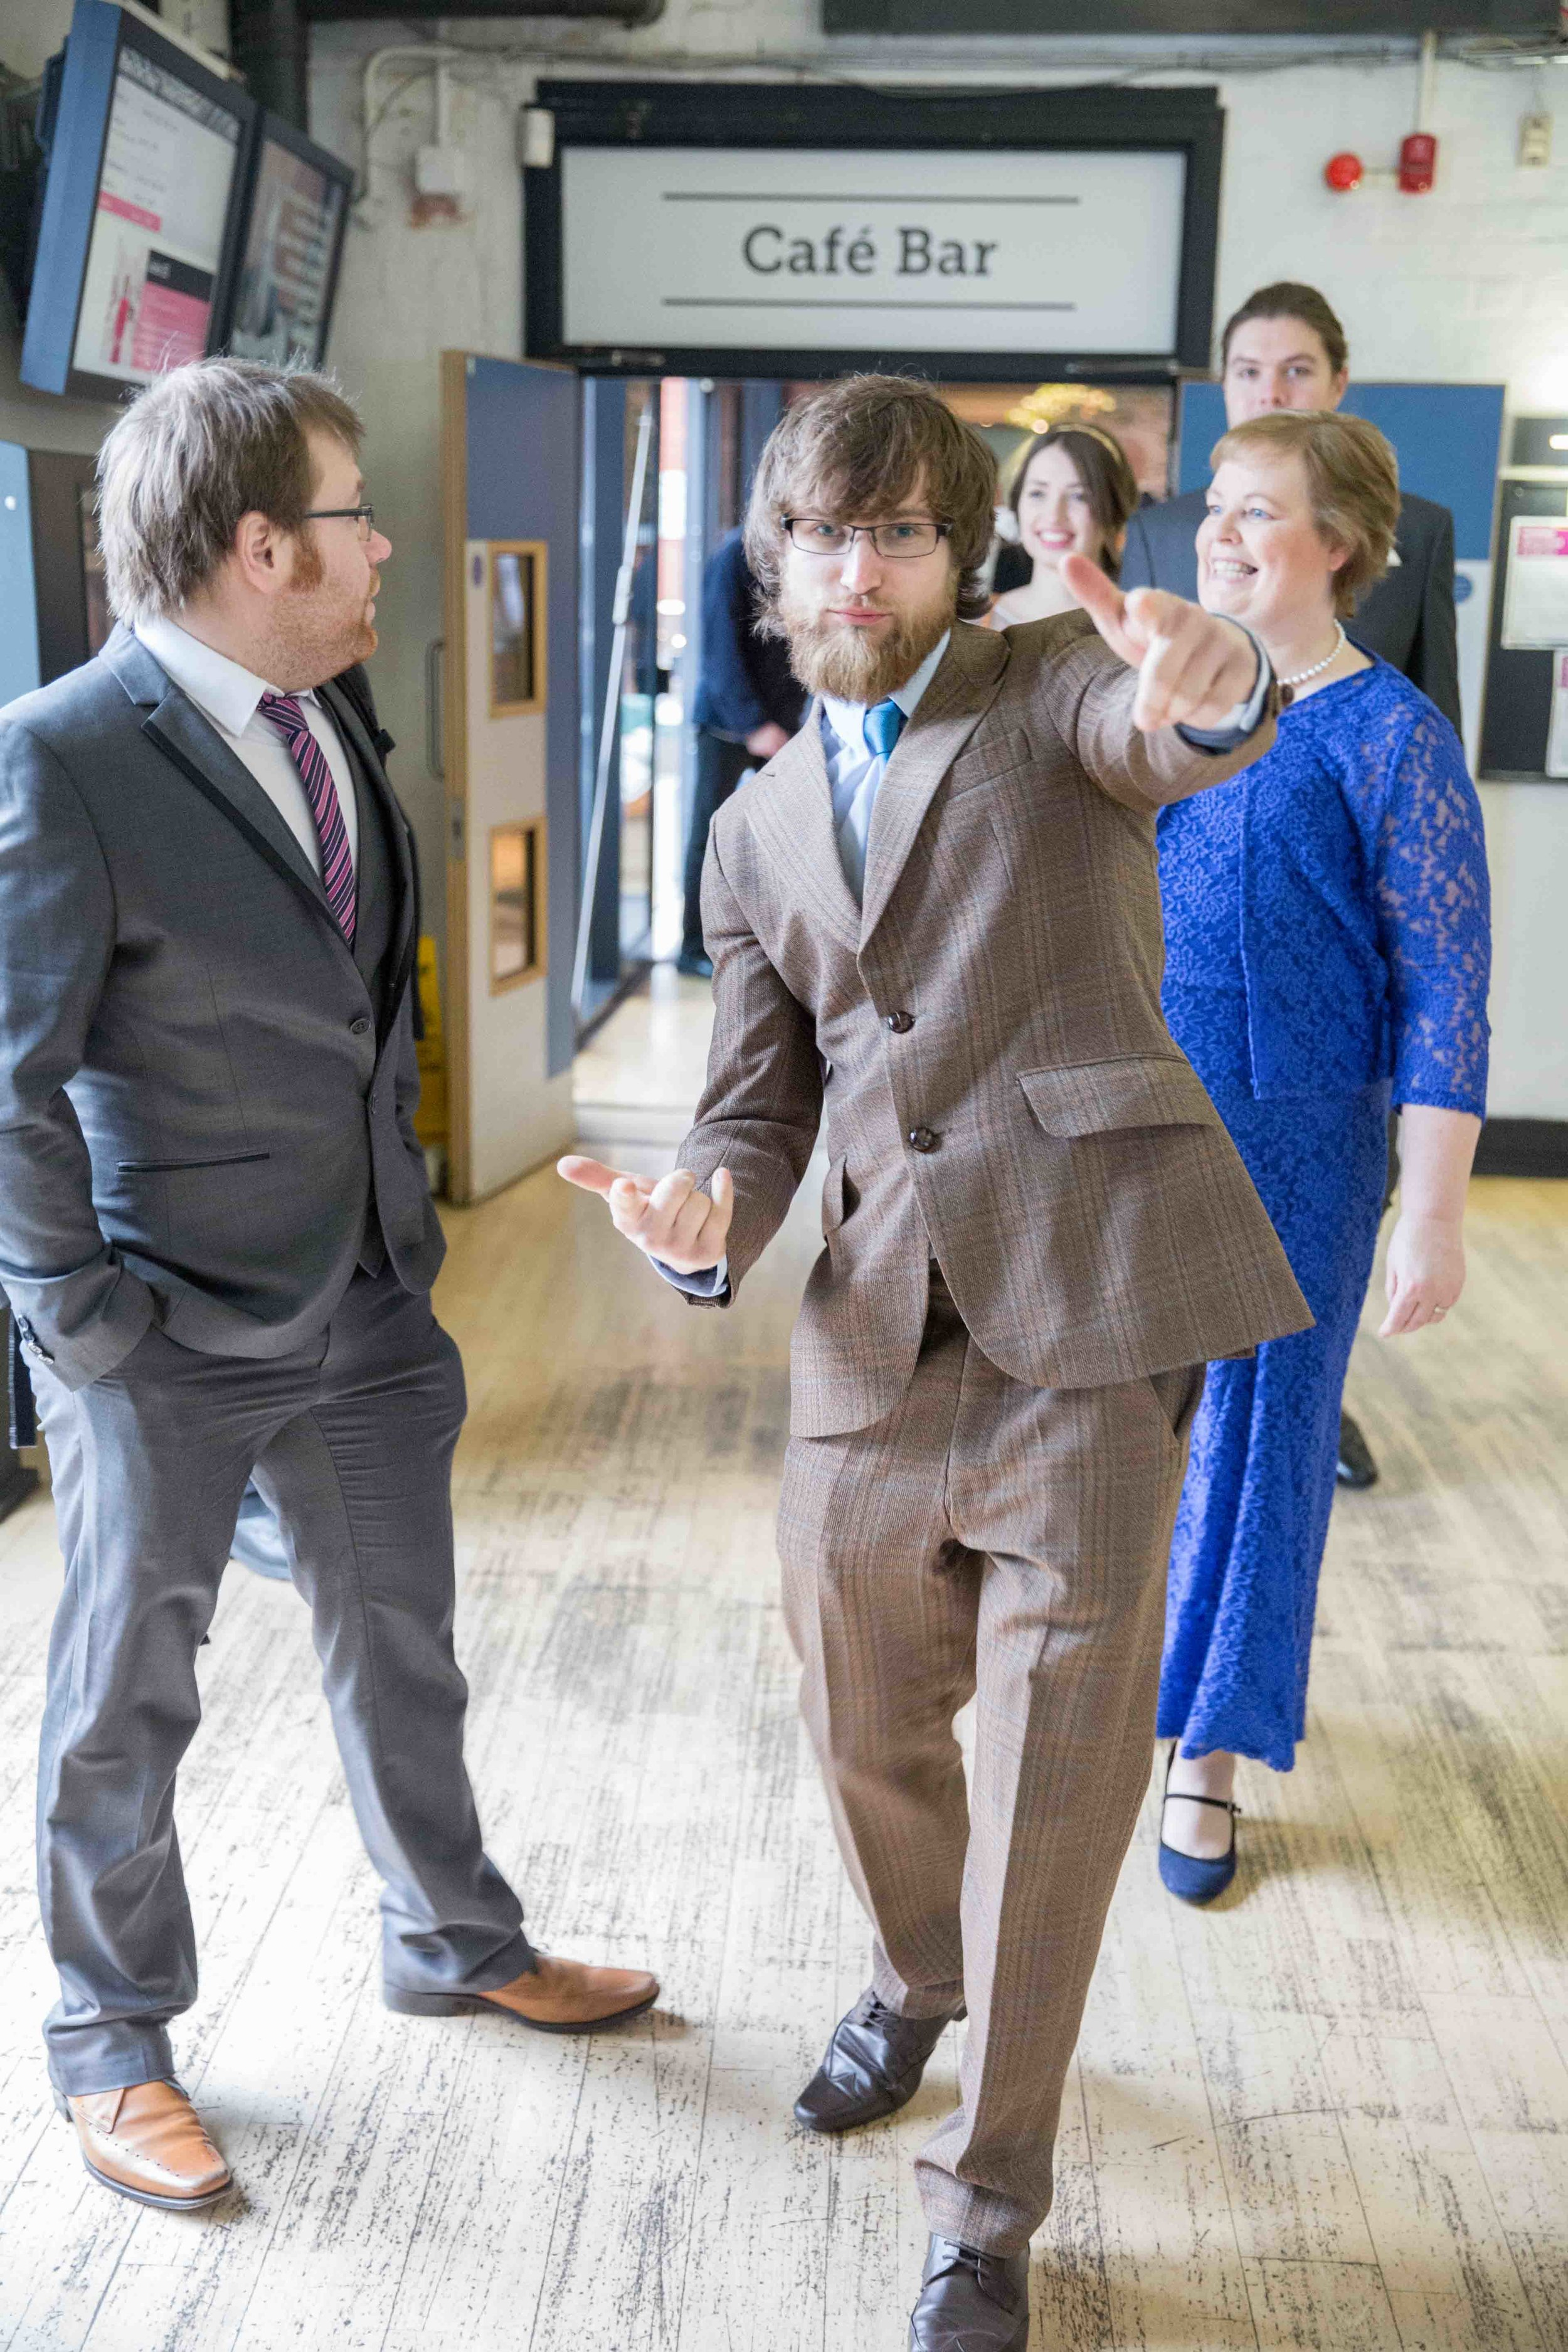 Adam & Faye - Wright Wedding Photography - Bristol Wedding Photographer -27-2.jpg